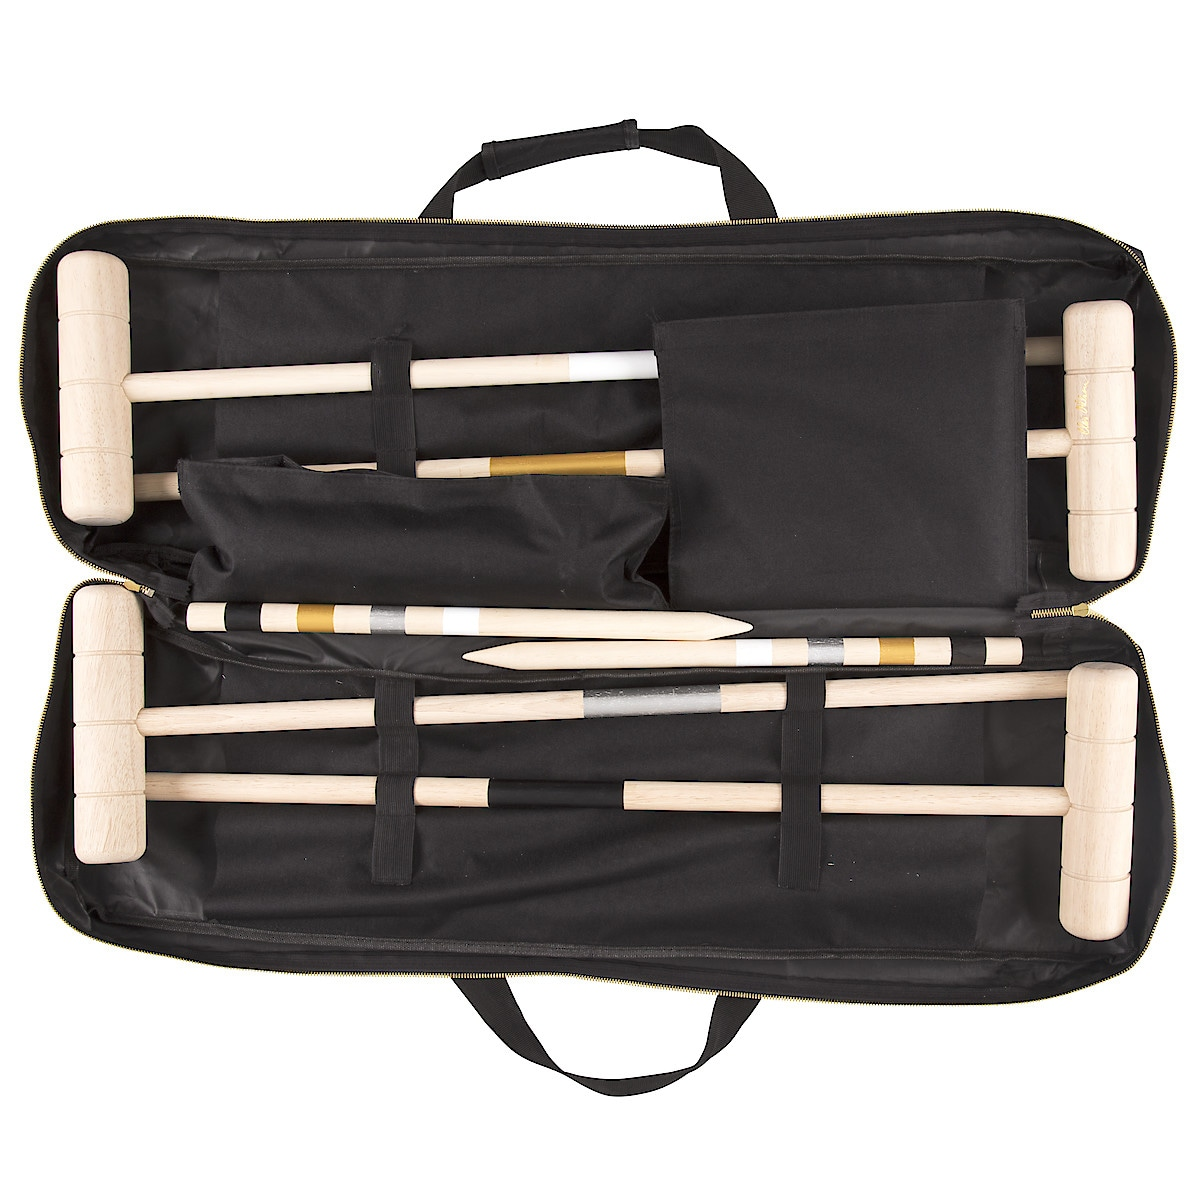 Limited Edition Croquet Set